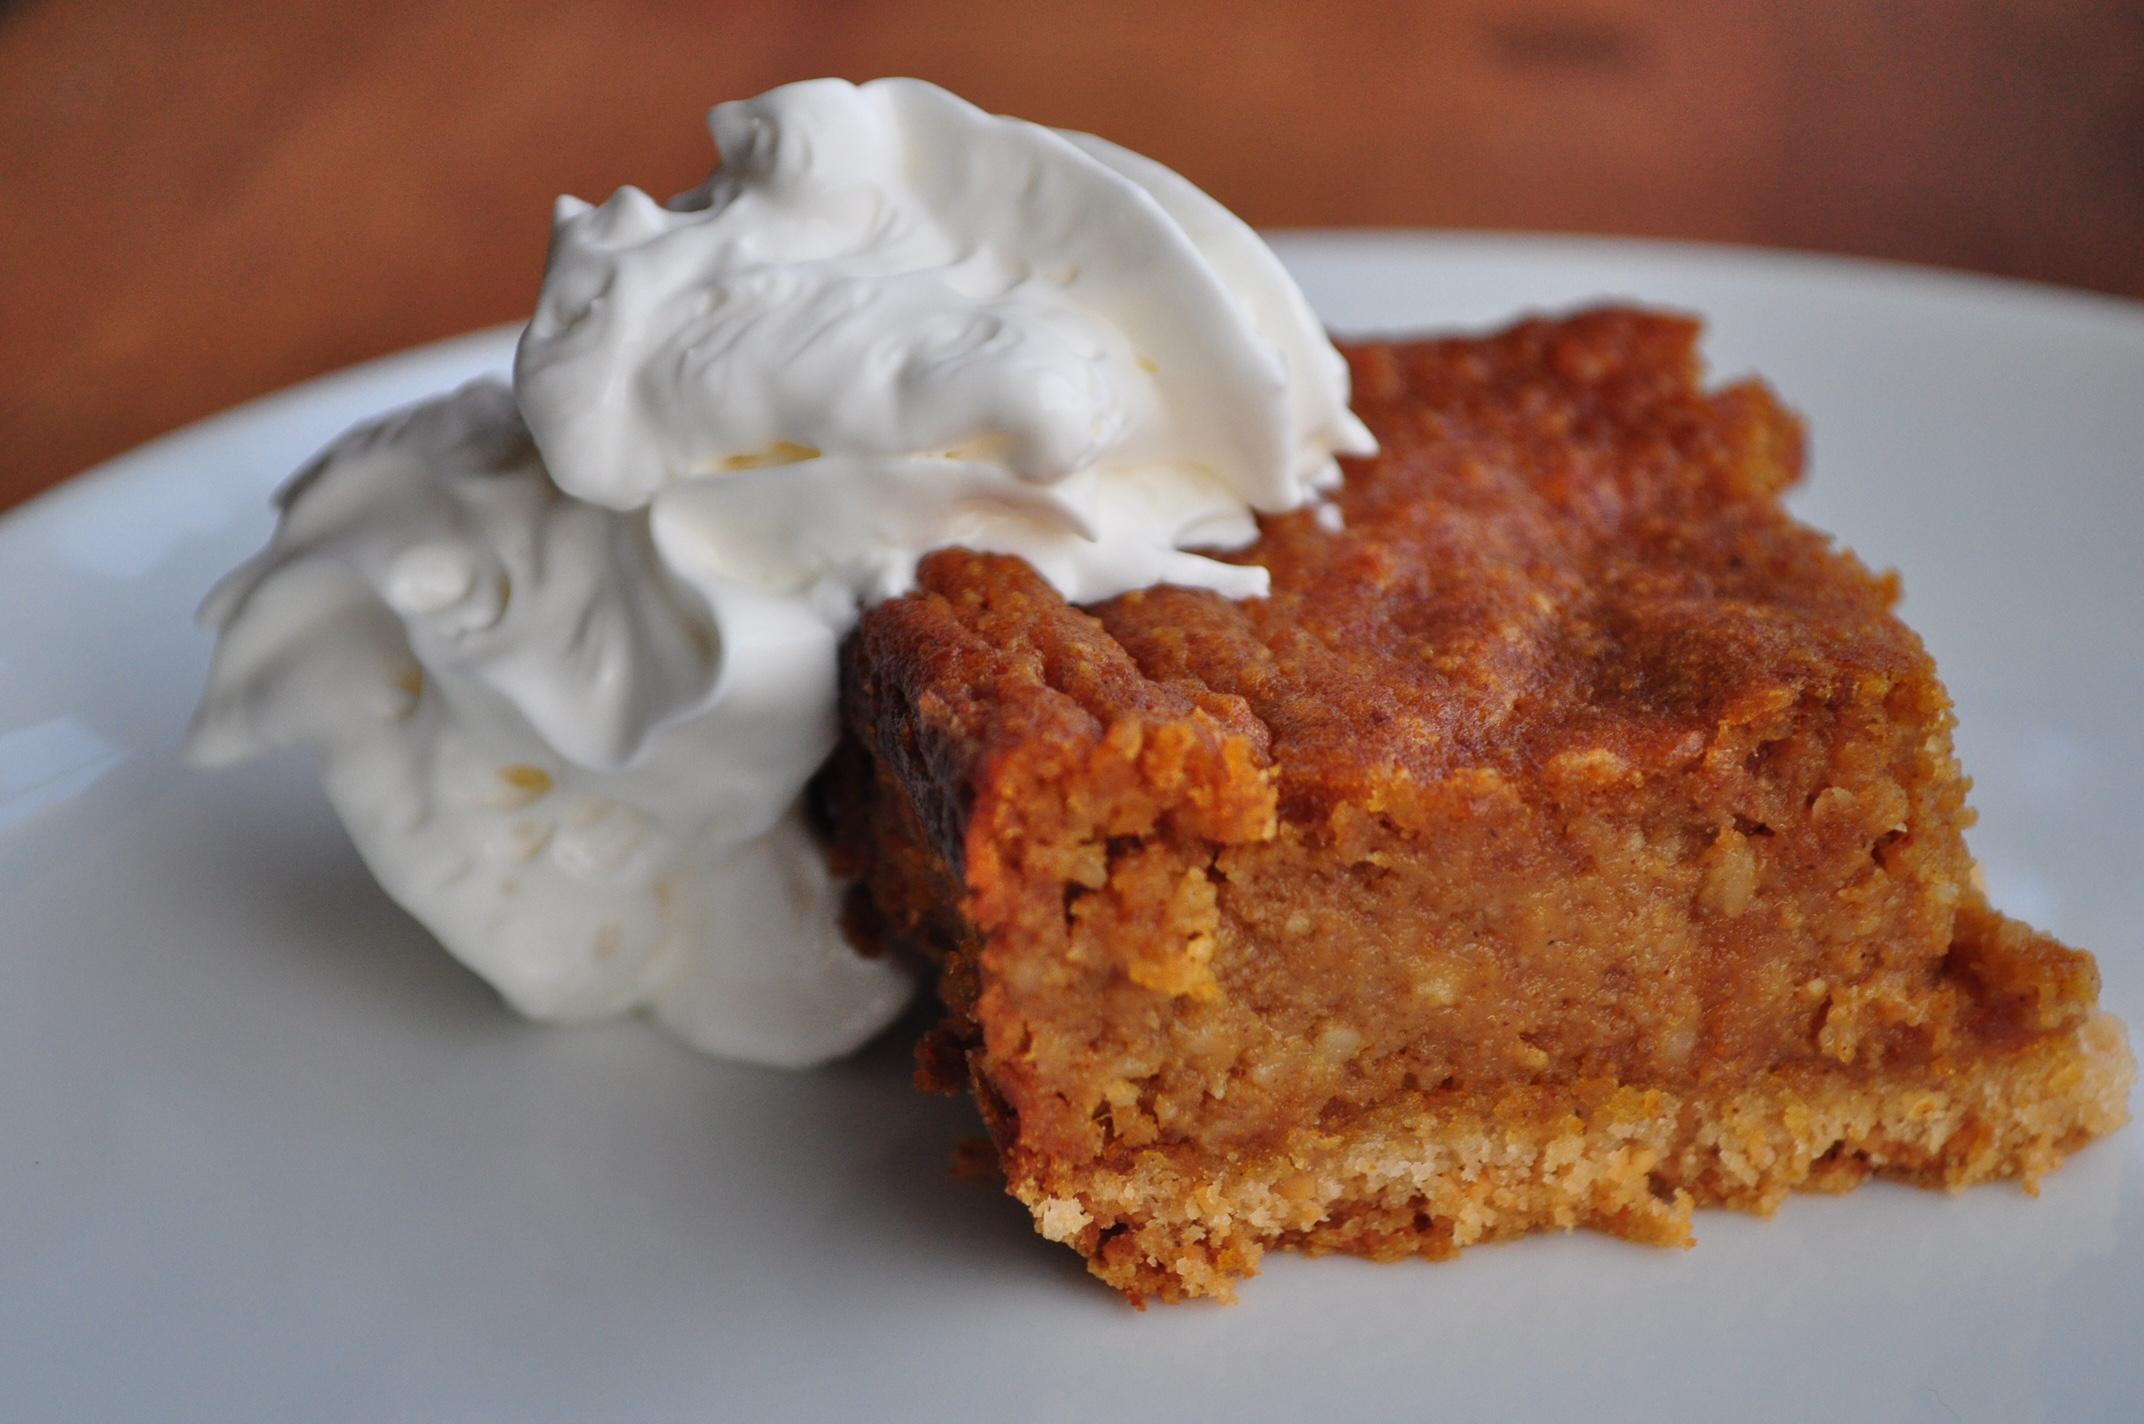 Spiced Paleo Pumpkin Pie Bars